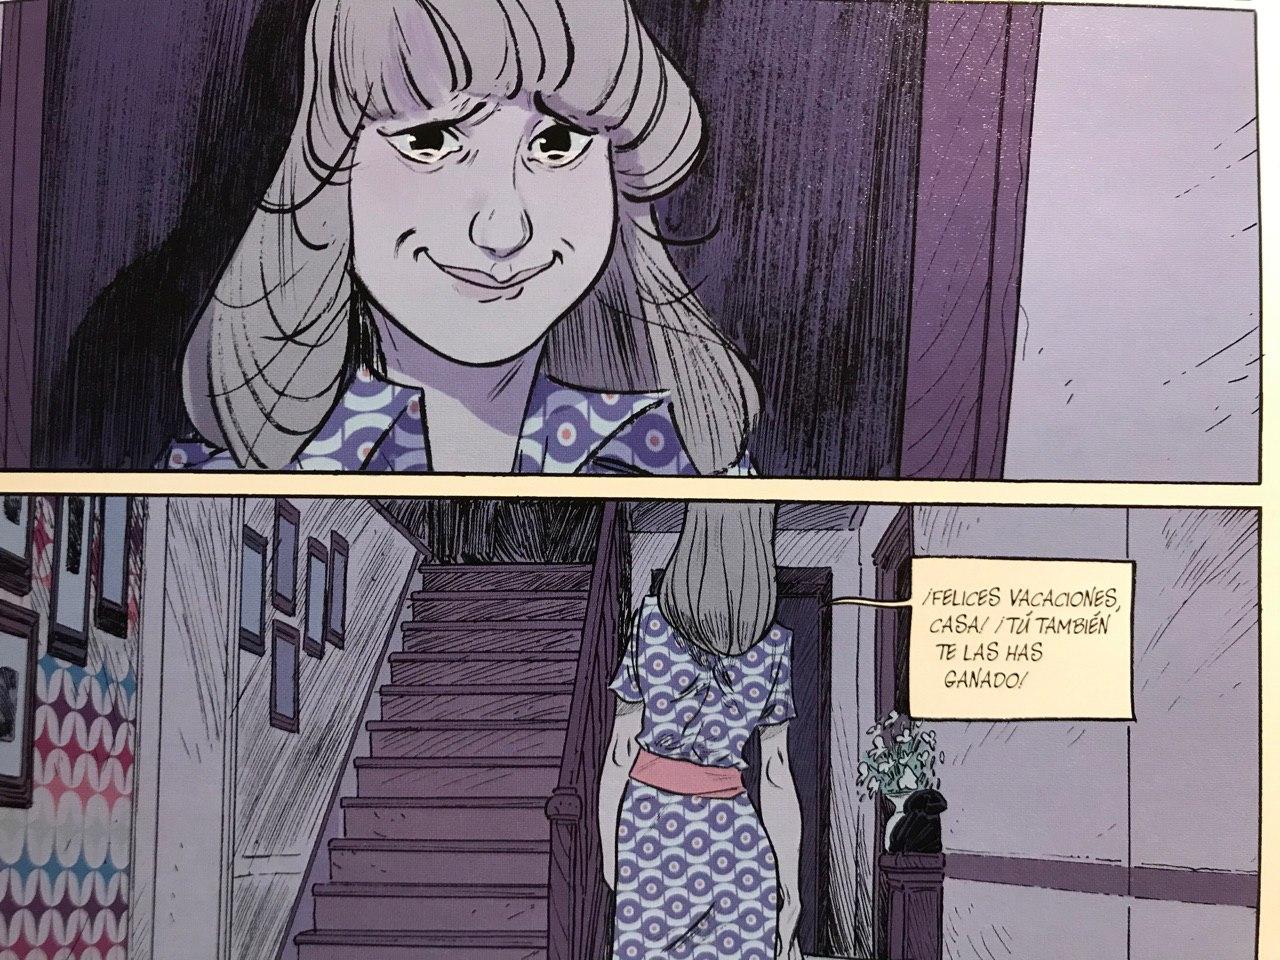 Golem-Comics-resena-los-buenos-veranos-05